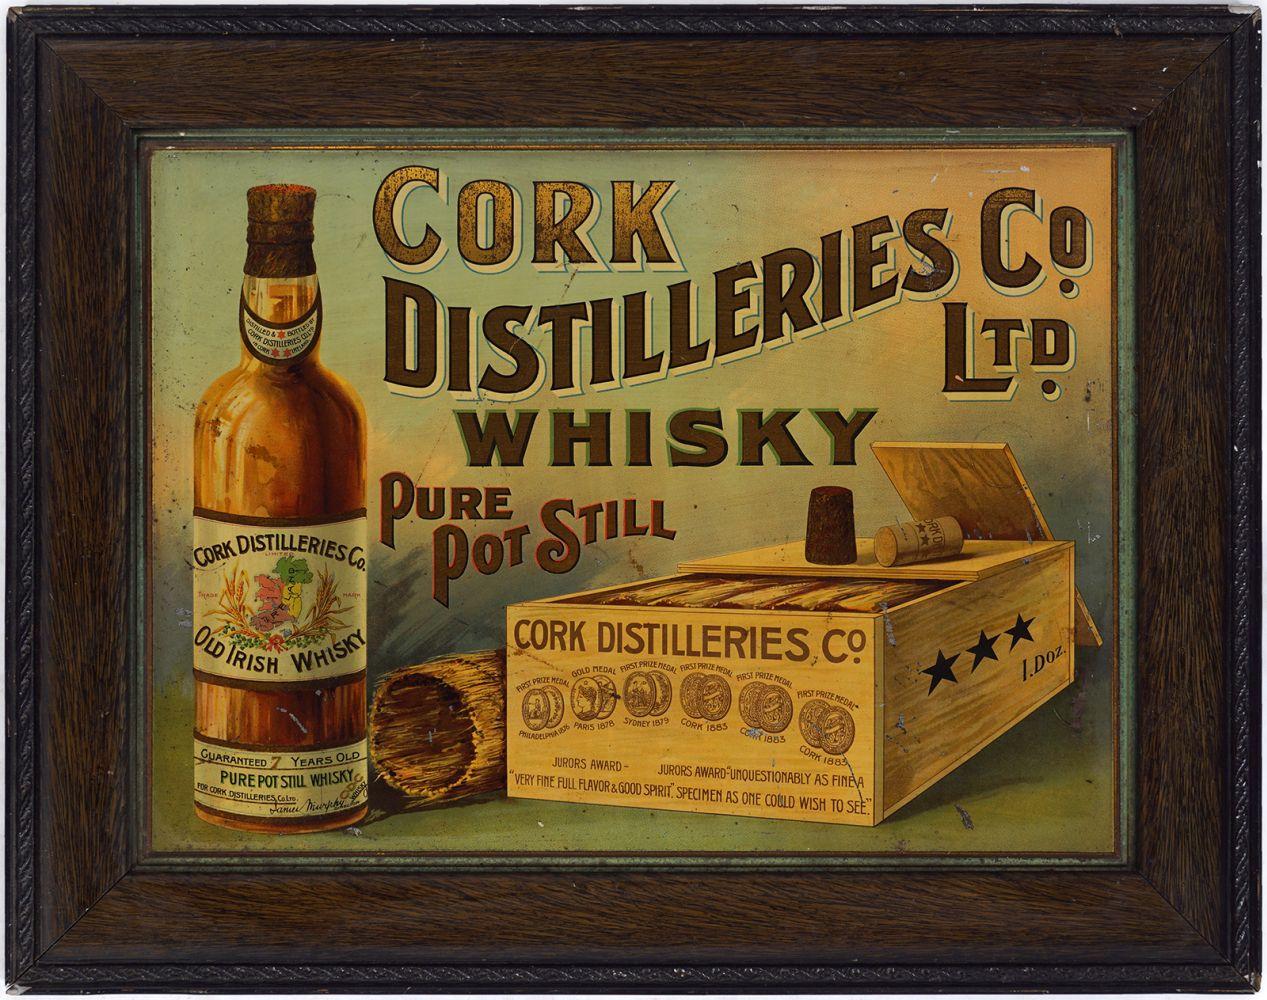 CORK DISTILLERIES CO. LTD WHISKY ORIGINAL POSTER